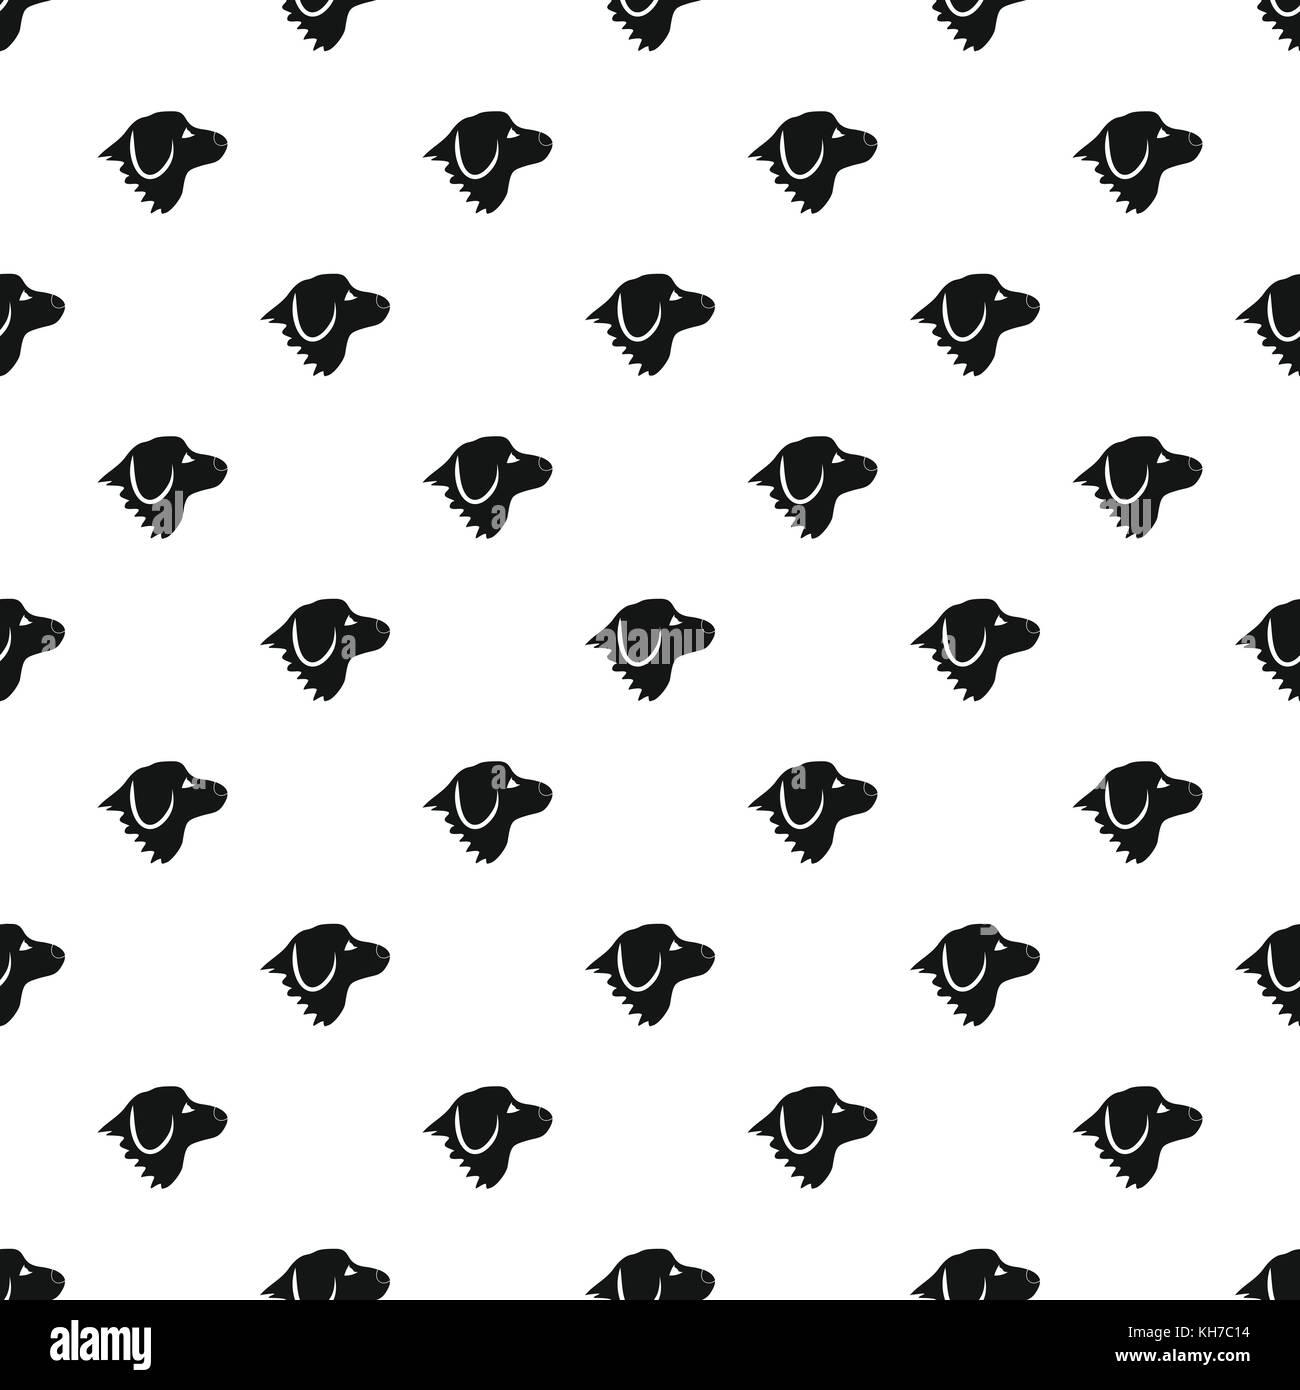 Retriever dog pattern, simple style - Stock Image